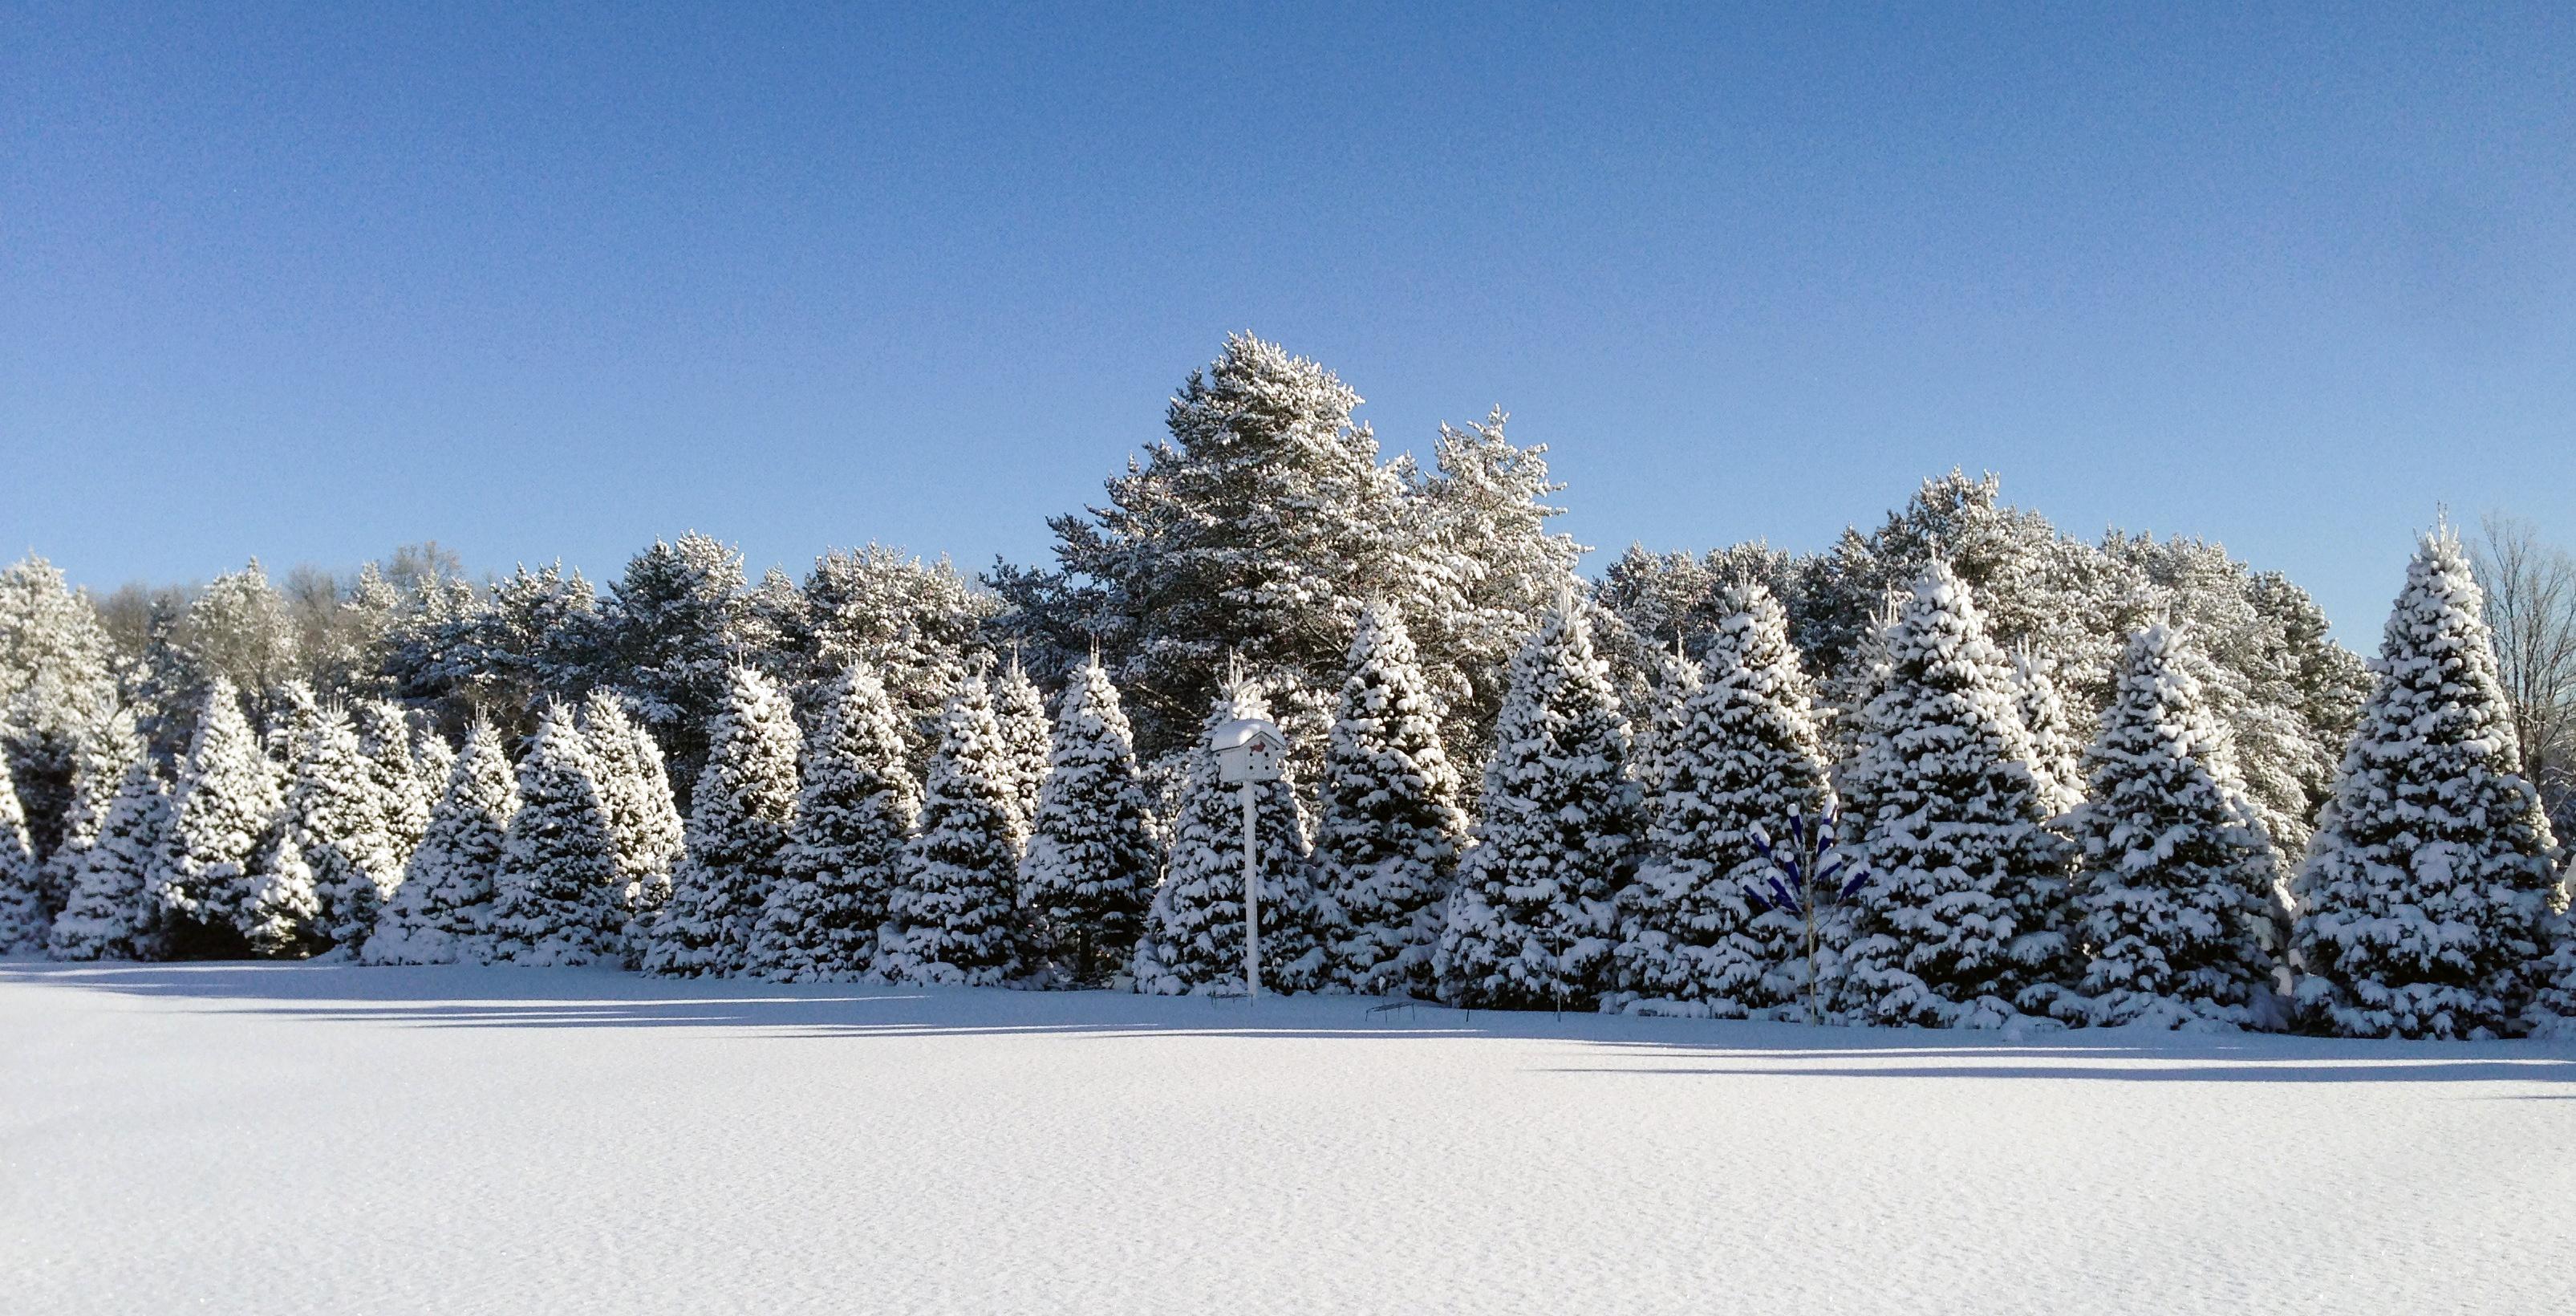 Fresh snowfall on beautiful evergreen trees in Wisconsin.